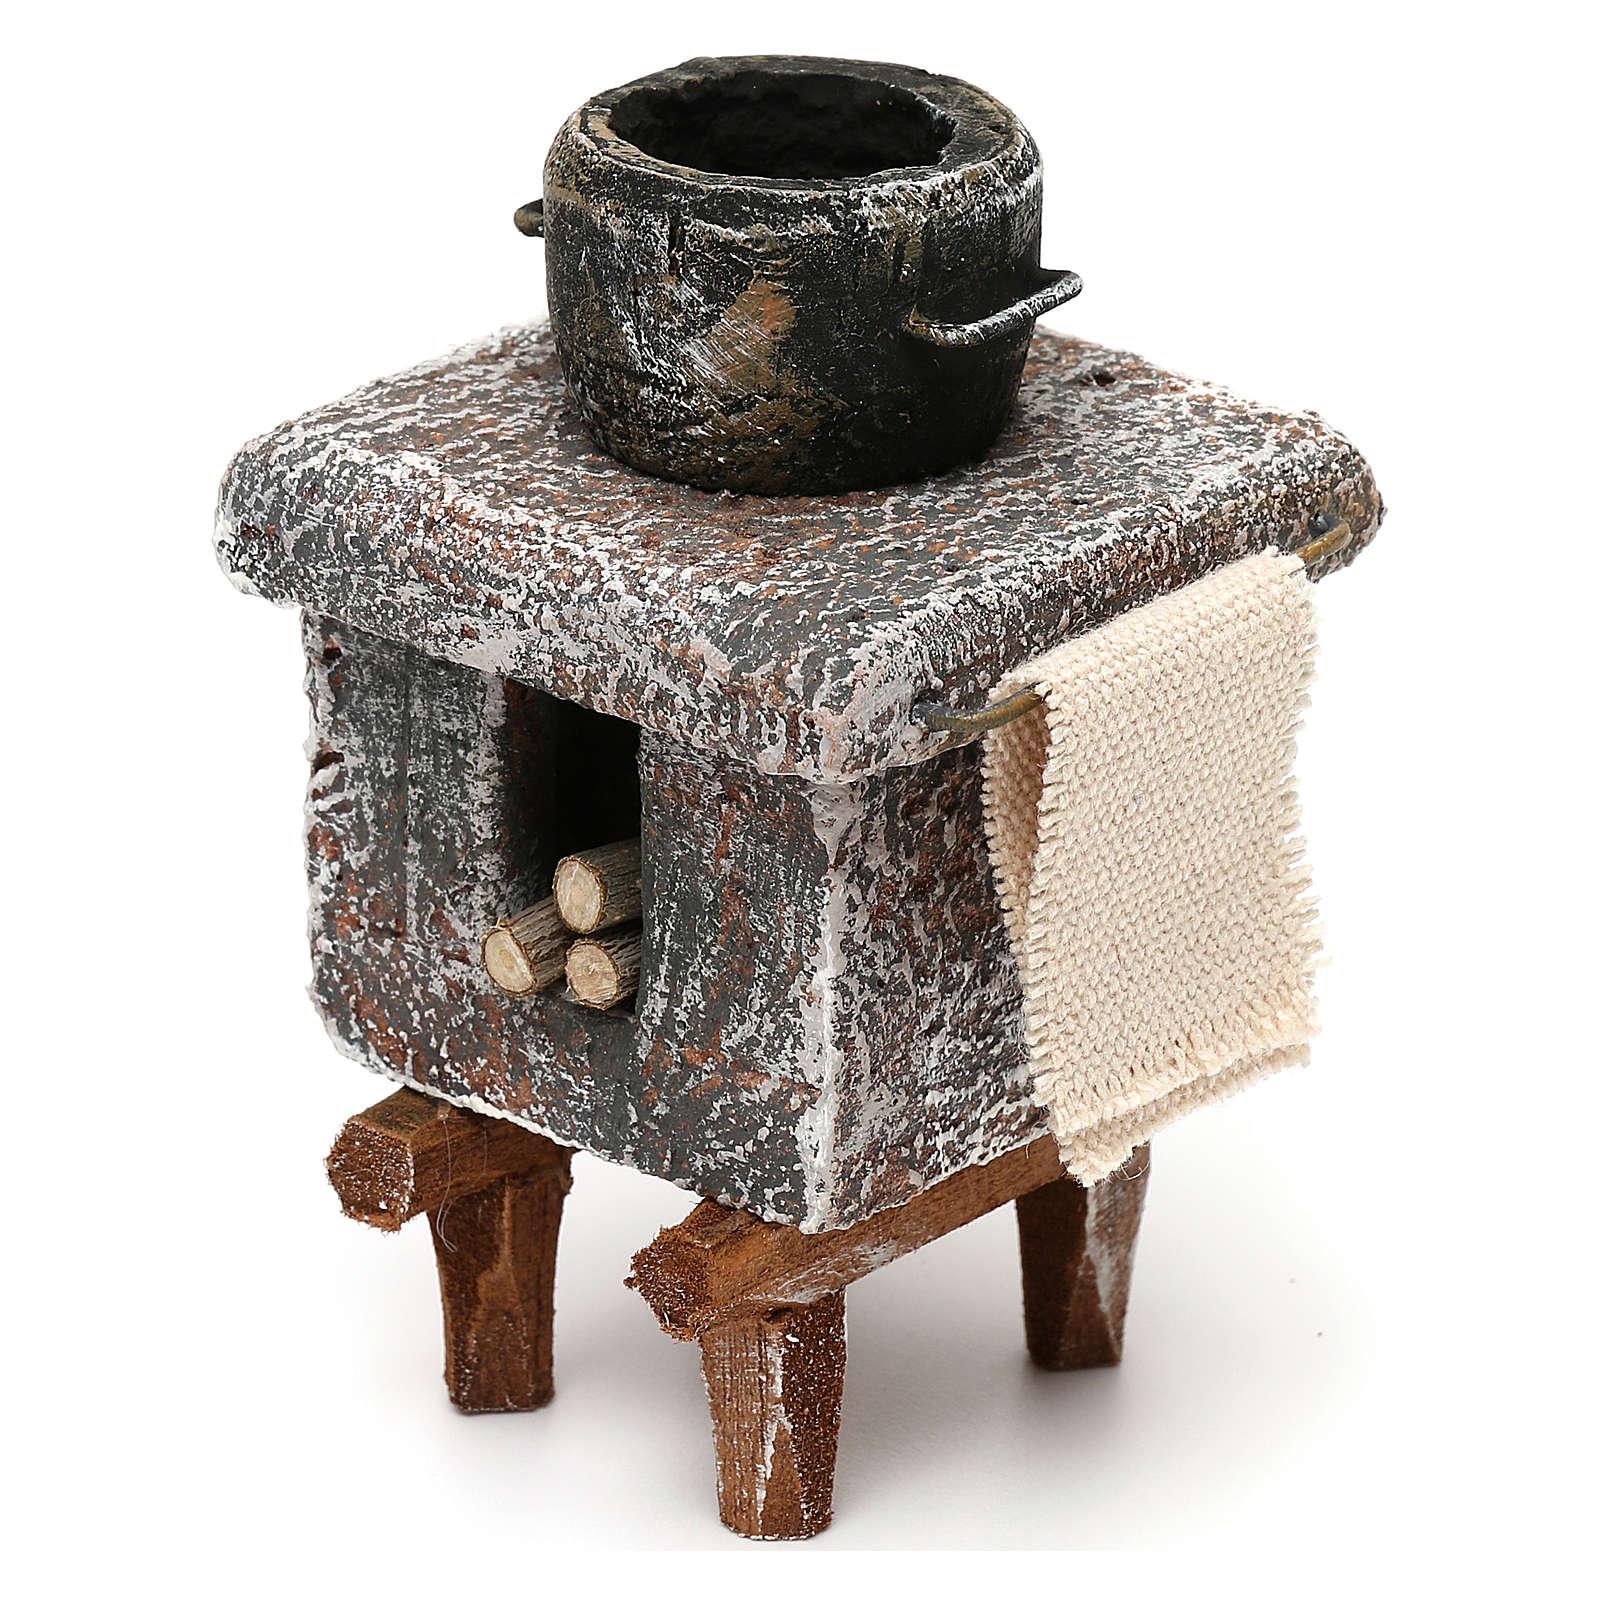 Resin kitchen with pot 10x5x5 cm for Nativity scene 10 cm 4